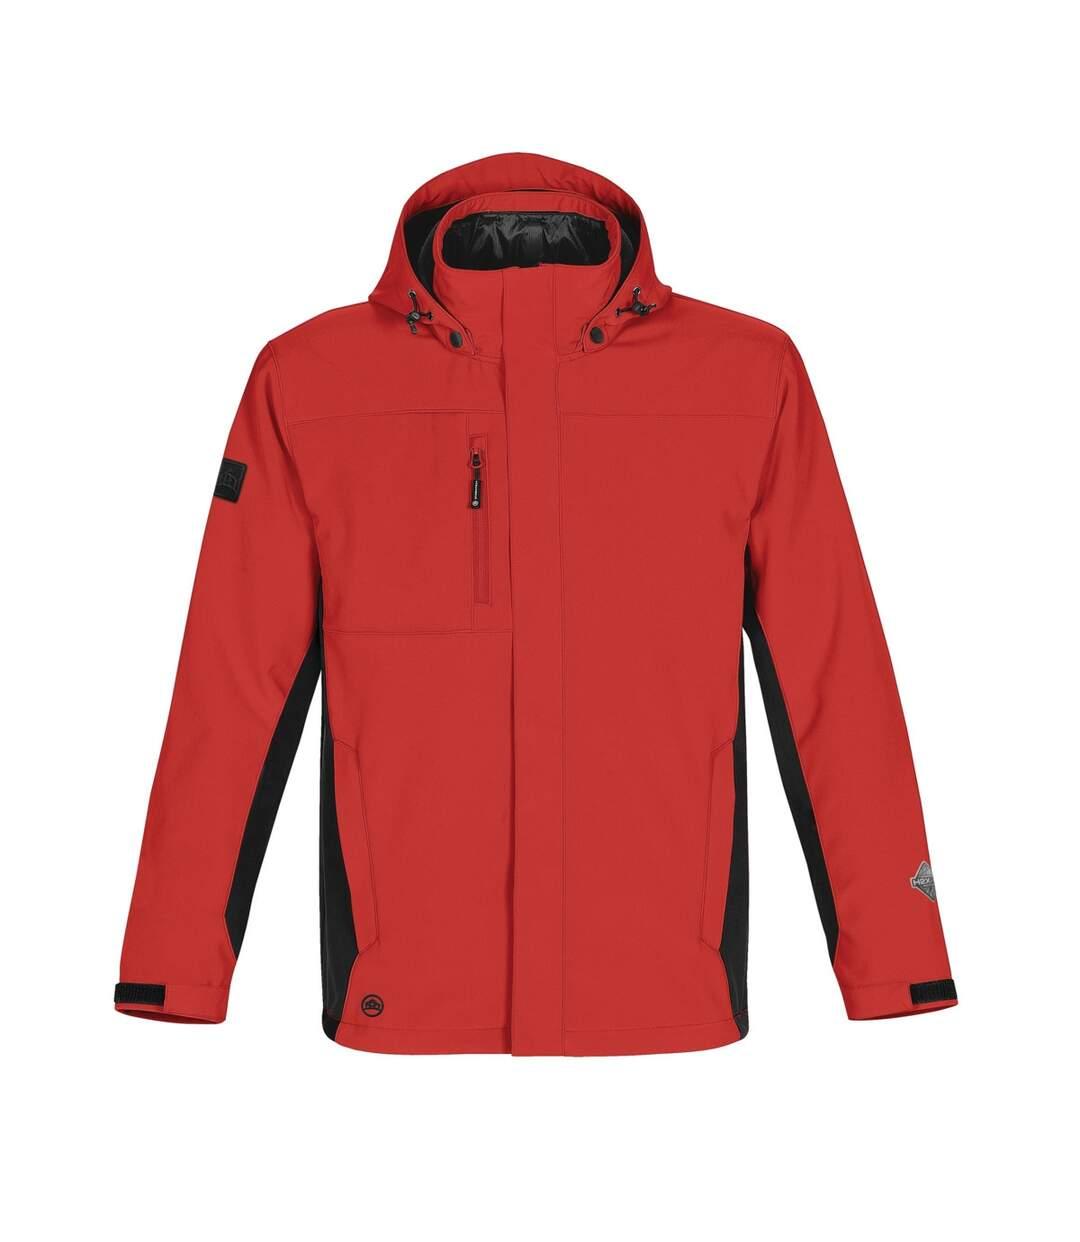 Stormtech Mens Atmosphere 3-in-1 Performance System Jacket (Waterproof & Breathable) (Stadium Red/Black) - UTBC3074